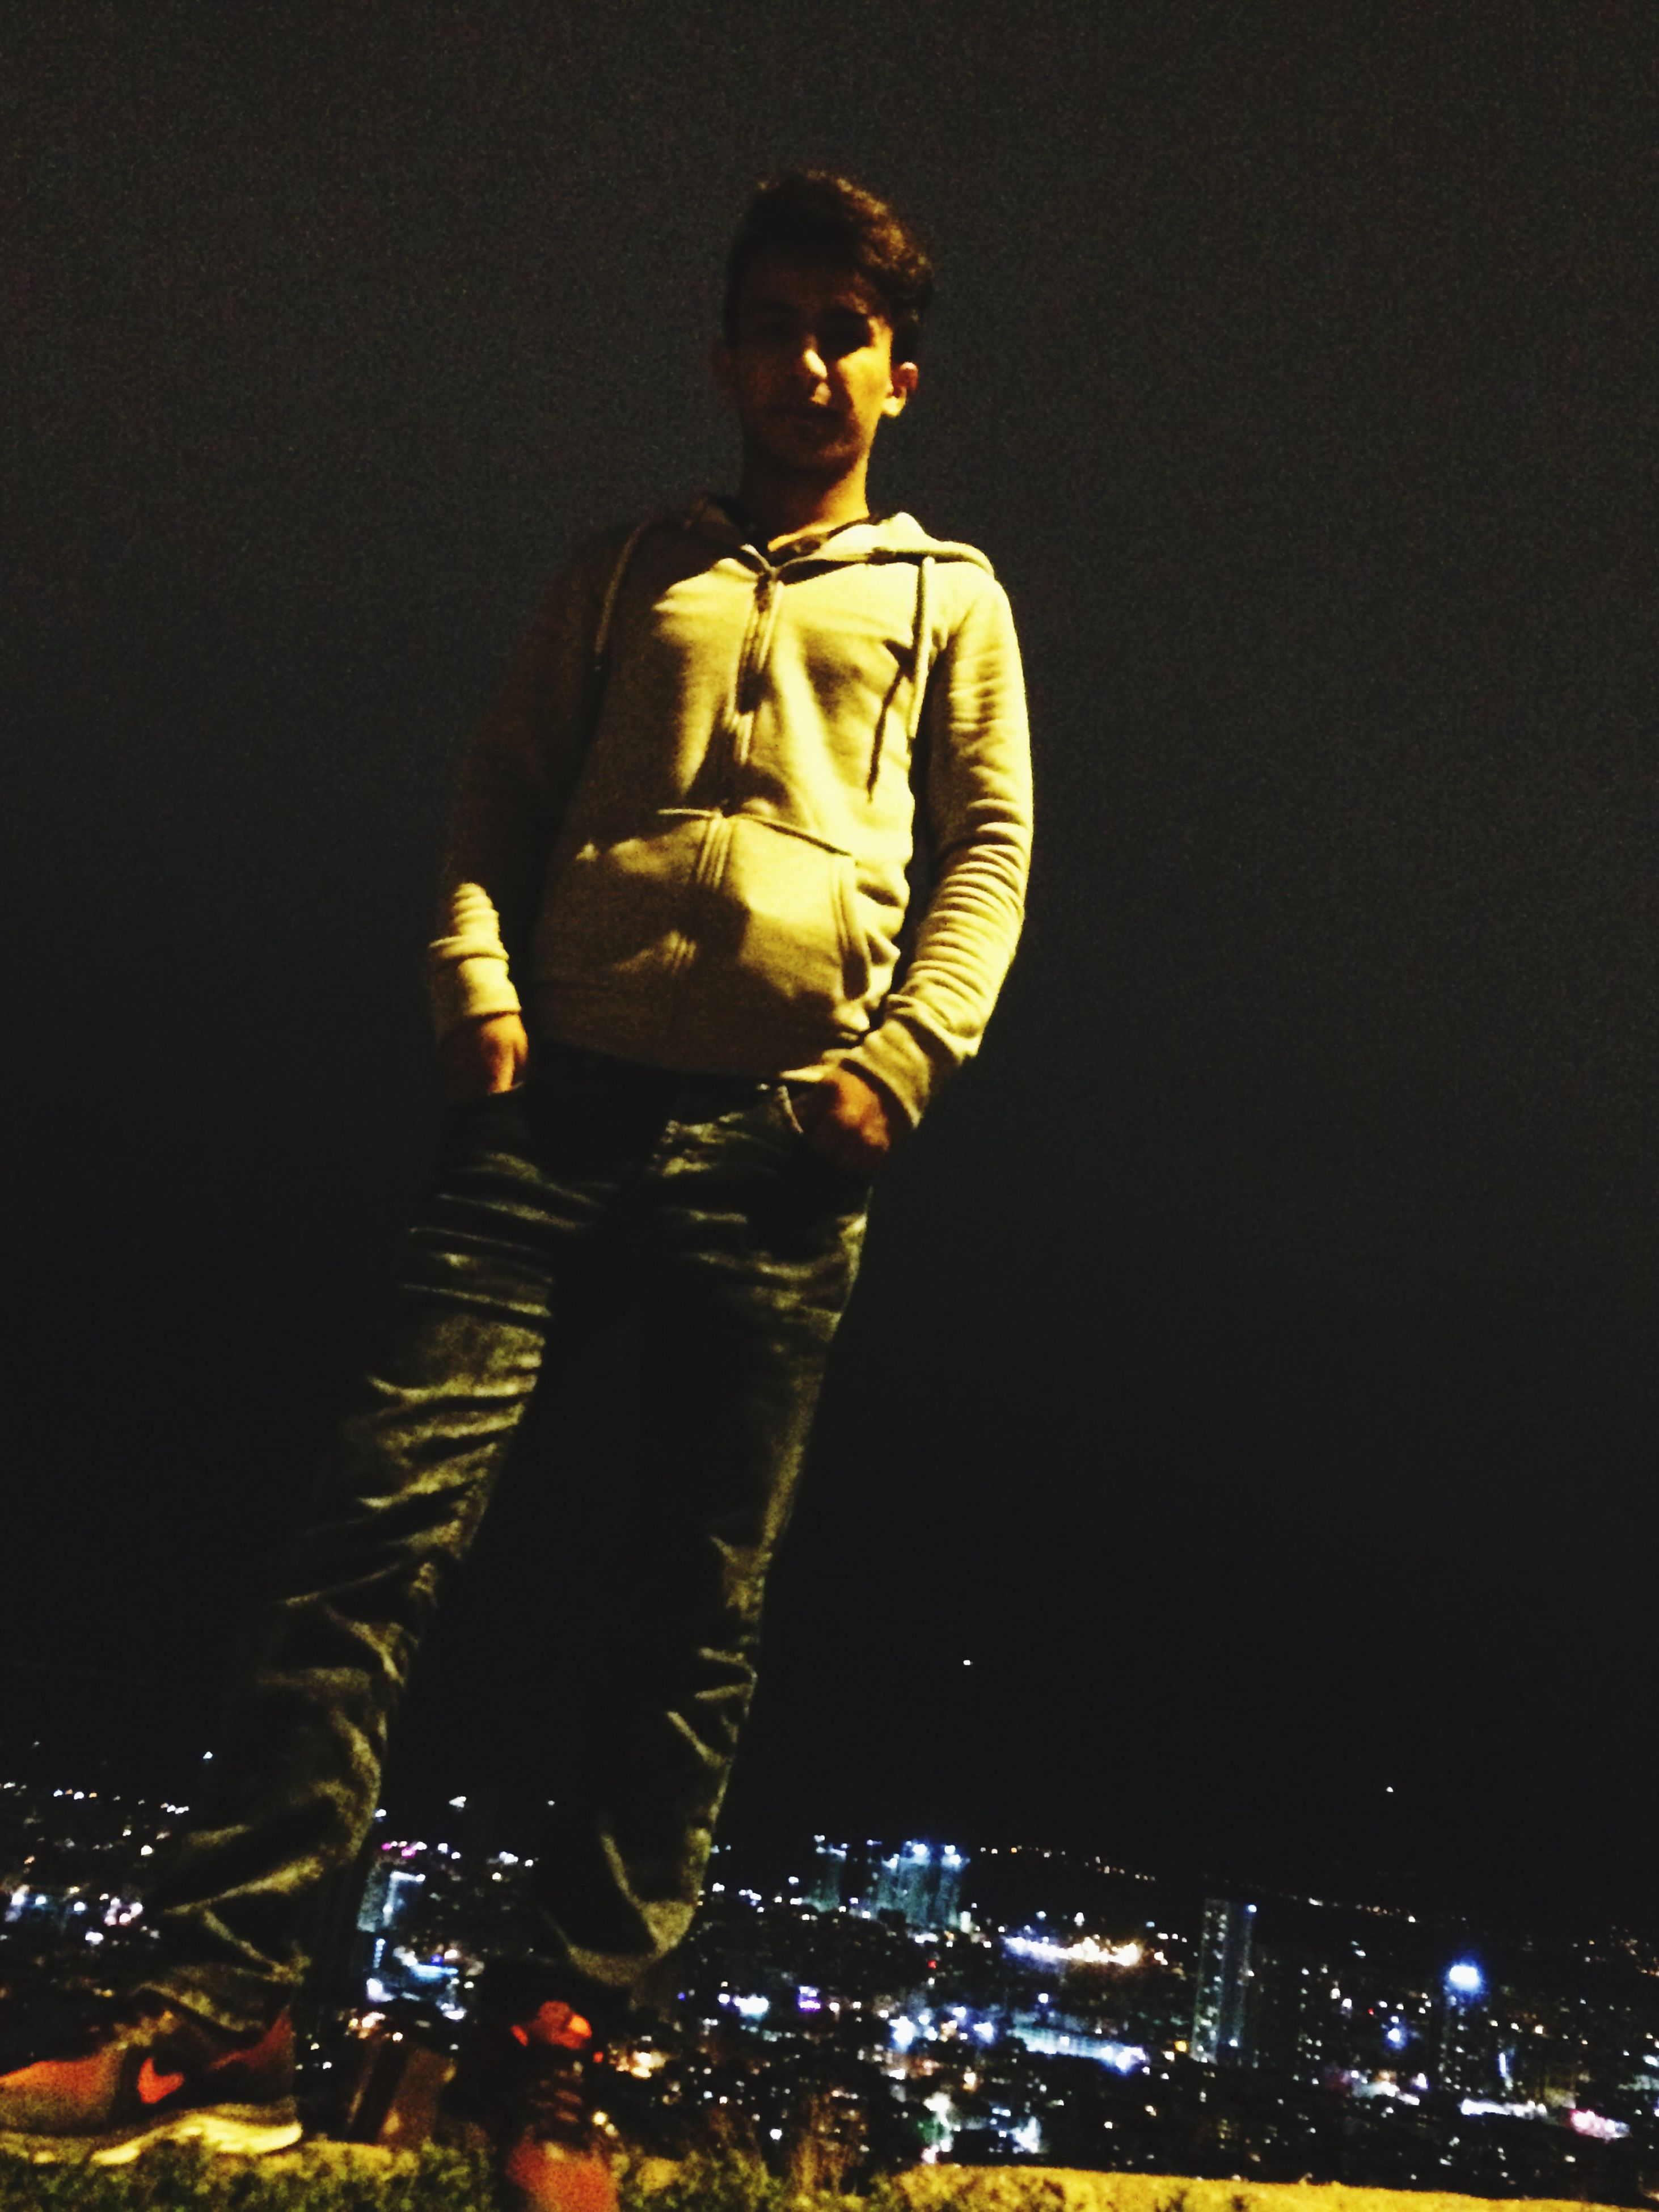 human representation, night, illuminated, sky, dark, confidence, black background, studio shot